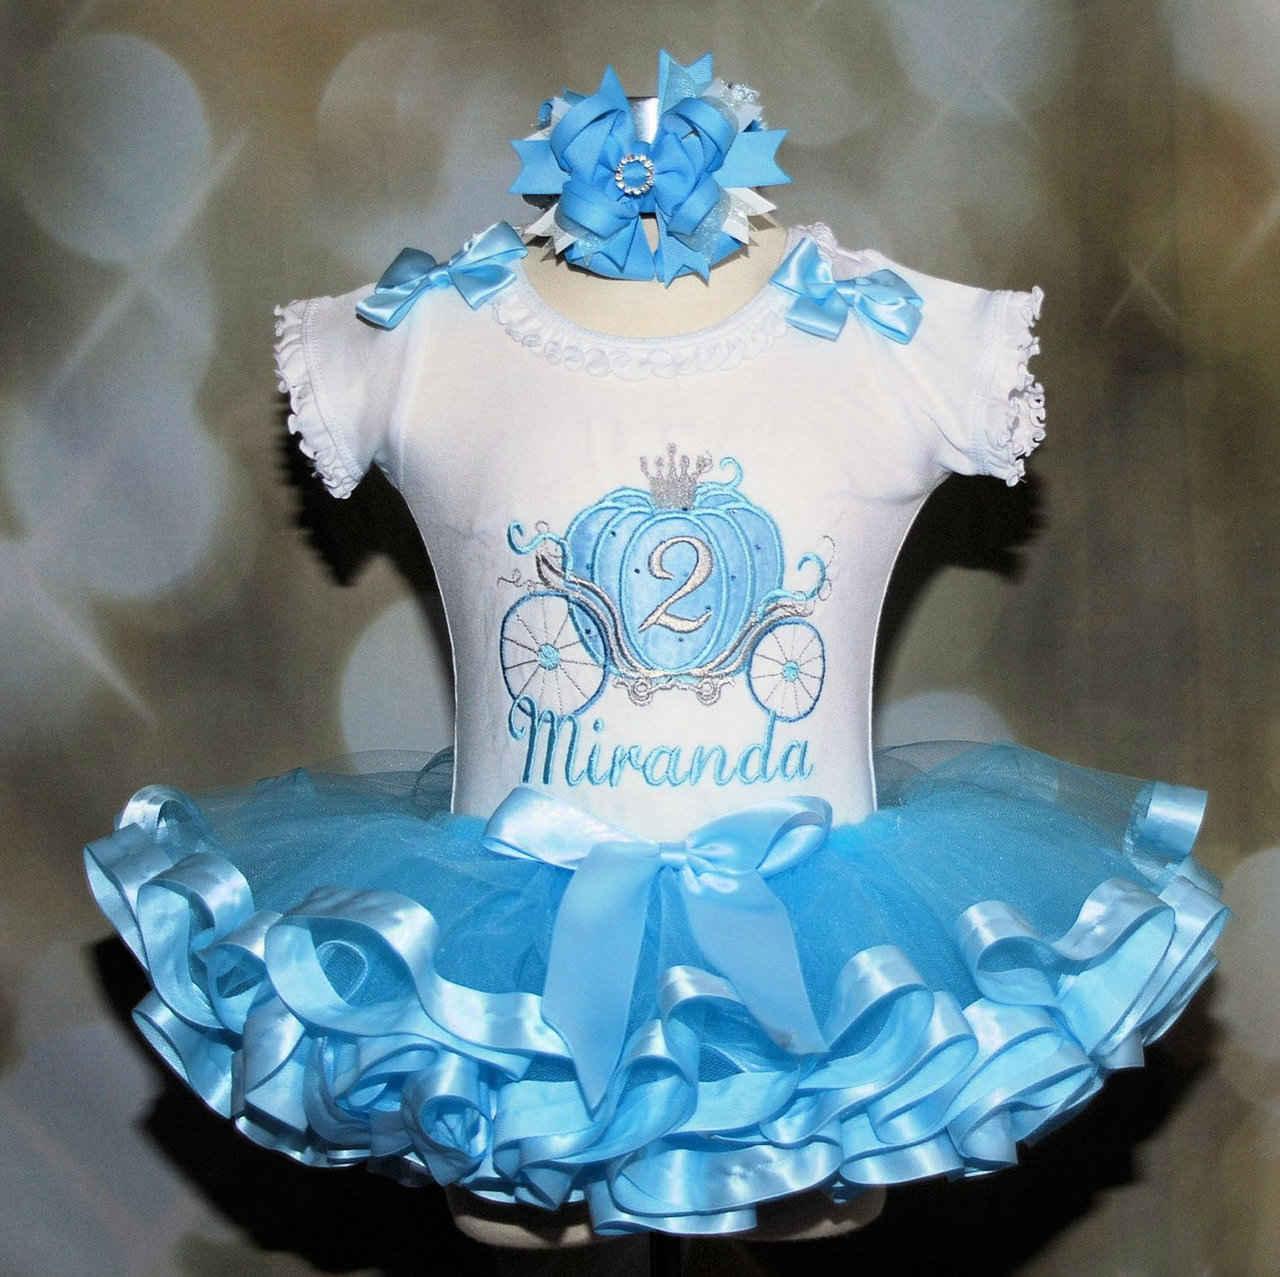 Cinderella Carriage Princess 2nd Birthday Tutu Outfit, Blue and Silver , Baby tutu, Princess 1st birthday tutu outfit-princess-1st-birthday-dress